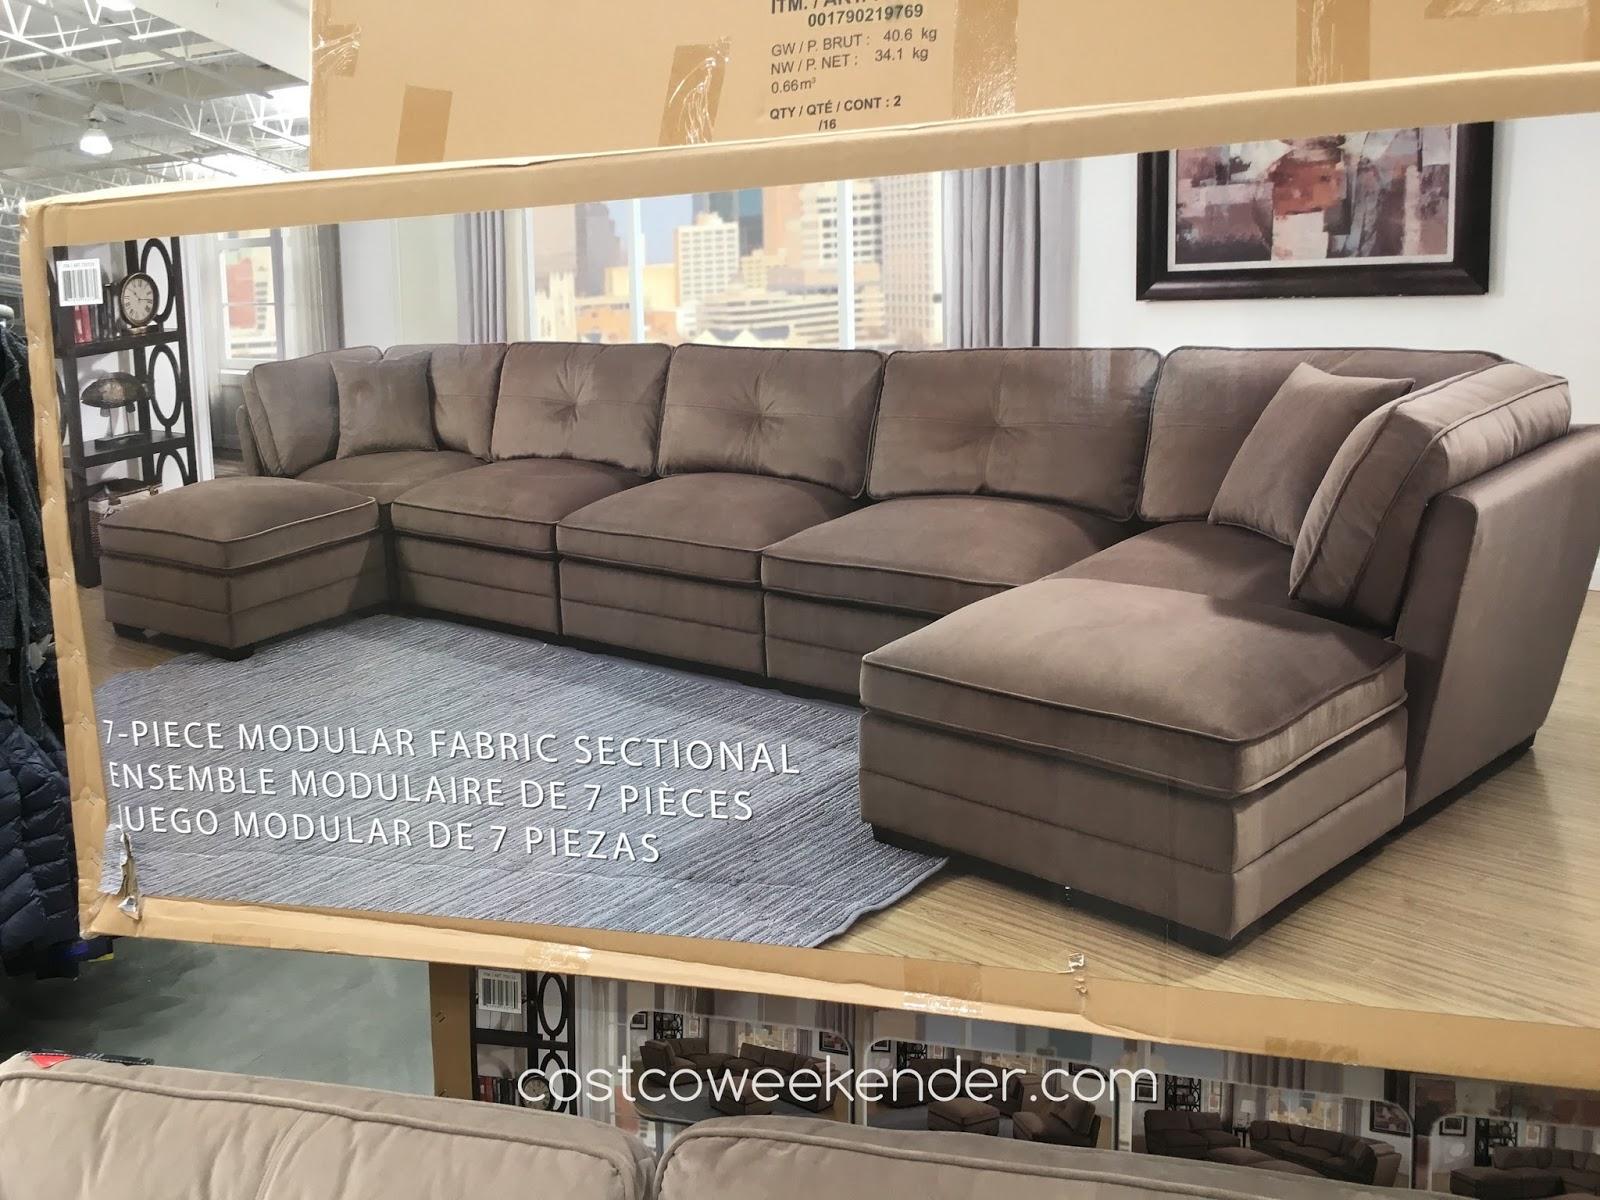 Modular Sectional Sofa Costco Costco 911353 6pc Modular Fabric Sectional 1 Costcochaser